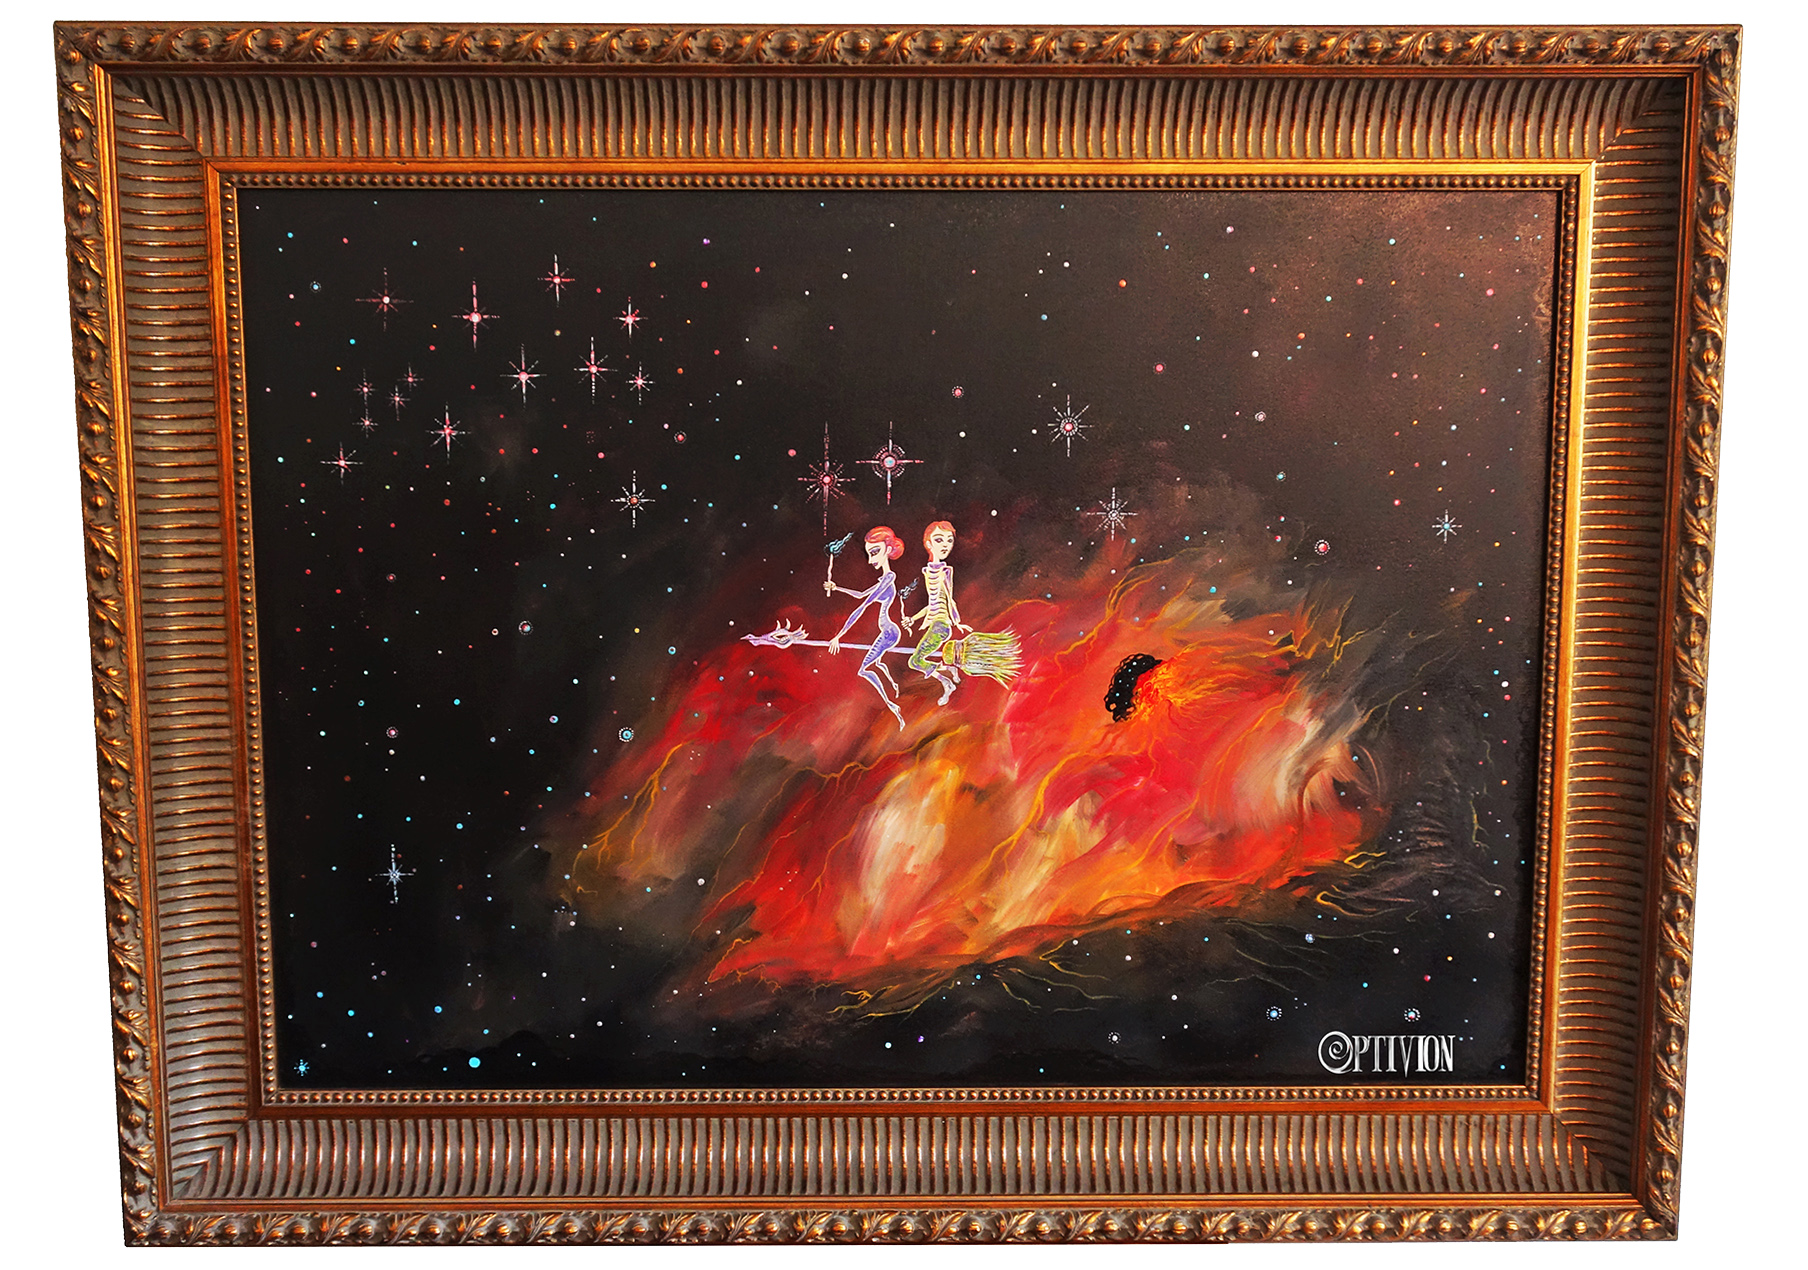 OptivioN - Bonding Through The Nebula